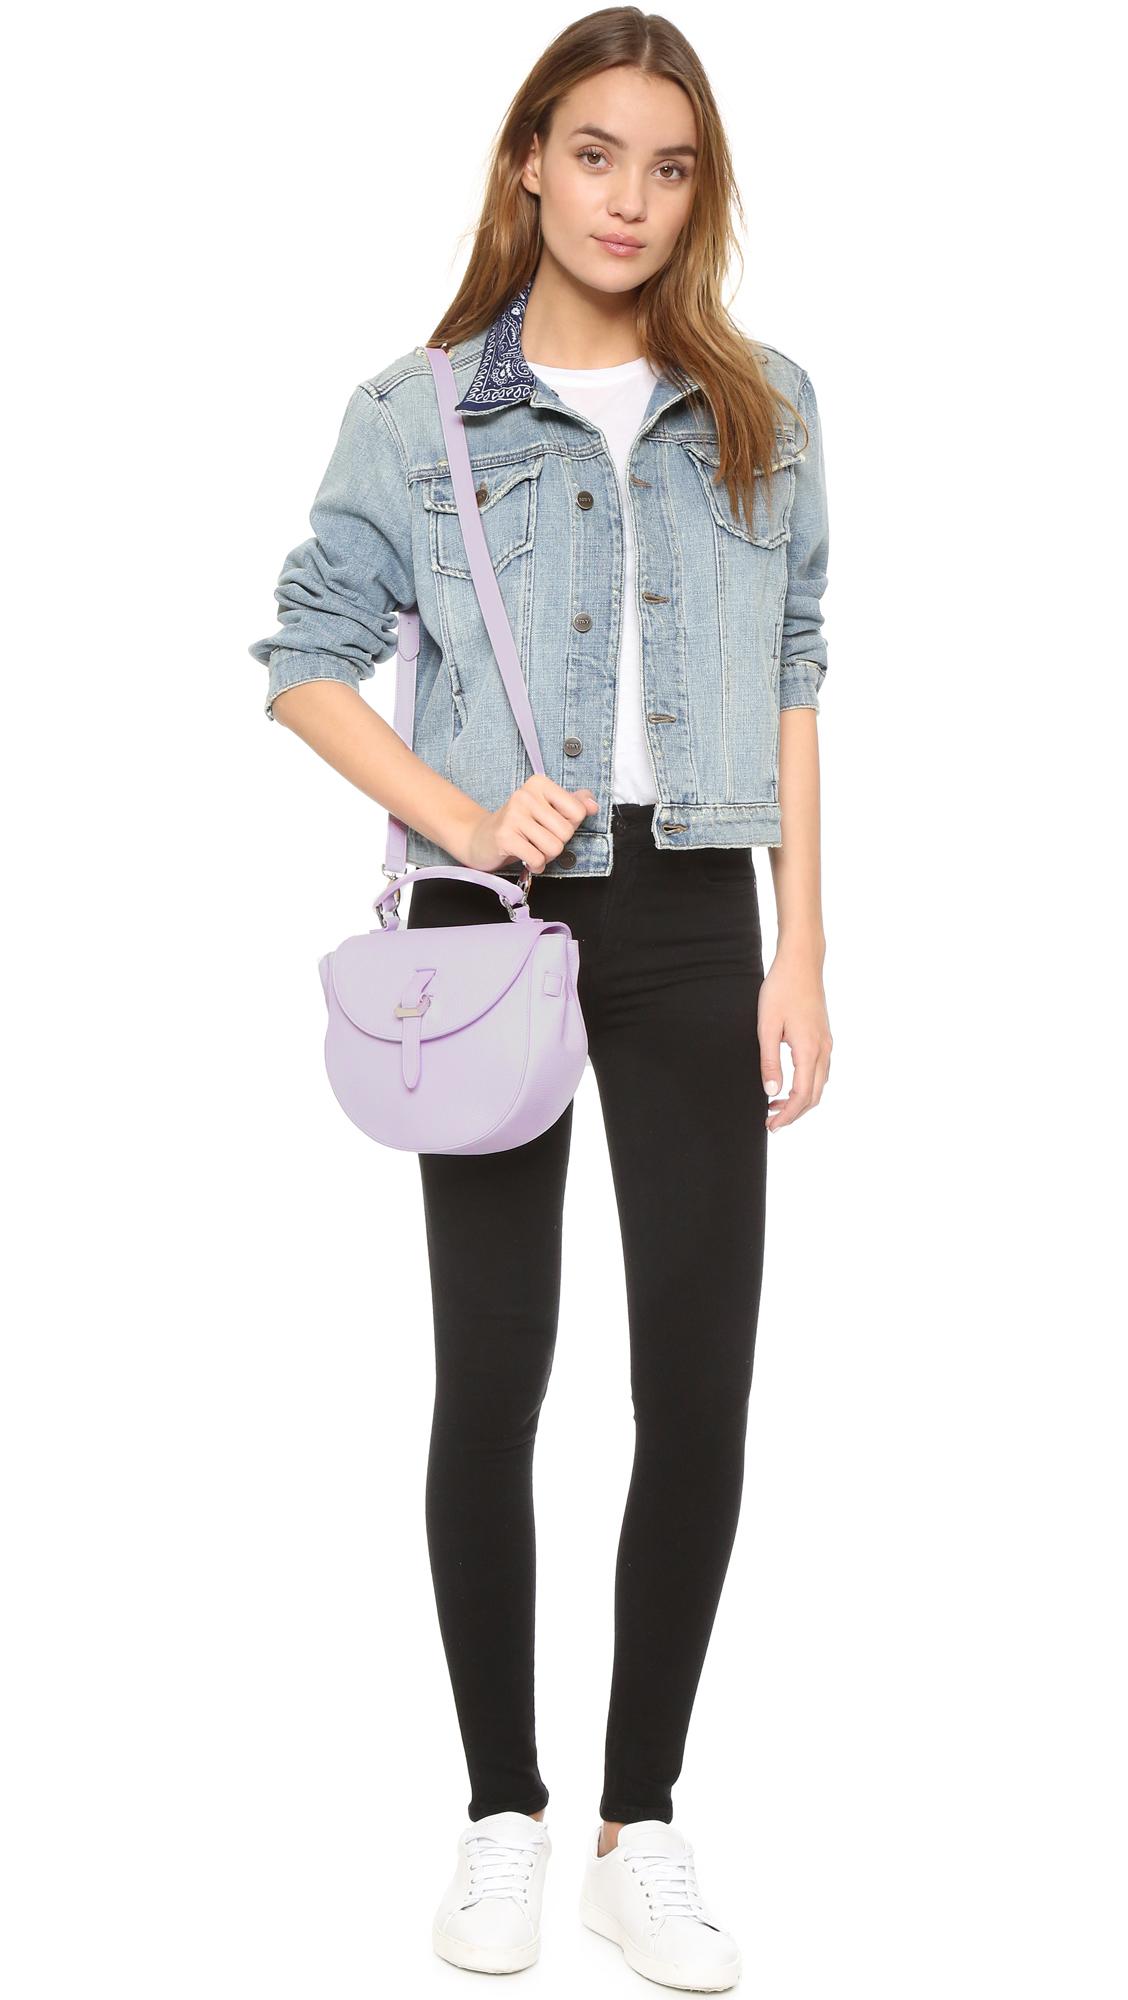 meli melo ortensia saddle bag in purple lyst. Black Bedroom Furniture Sets. Home Design Ideas